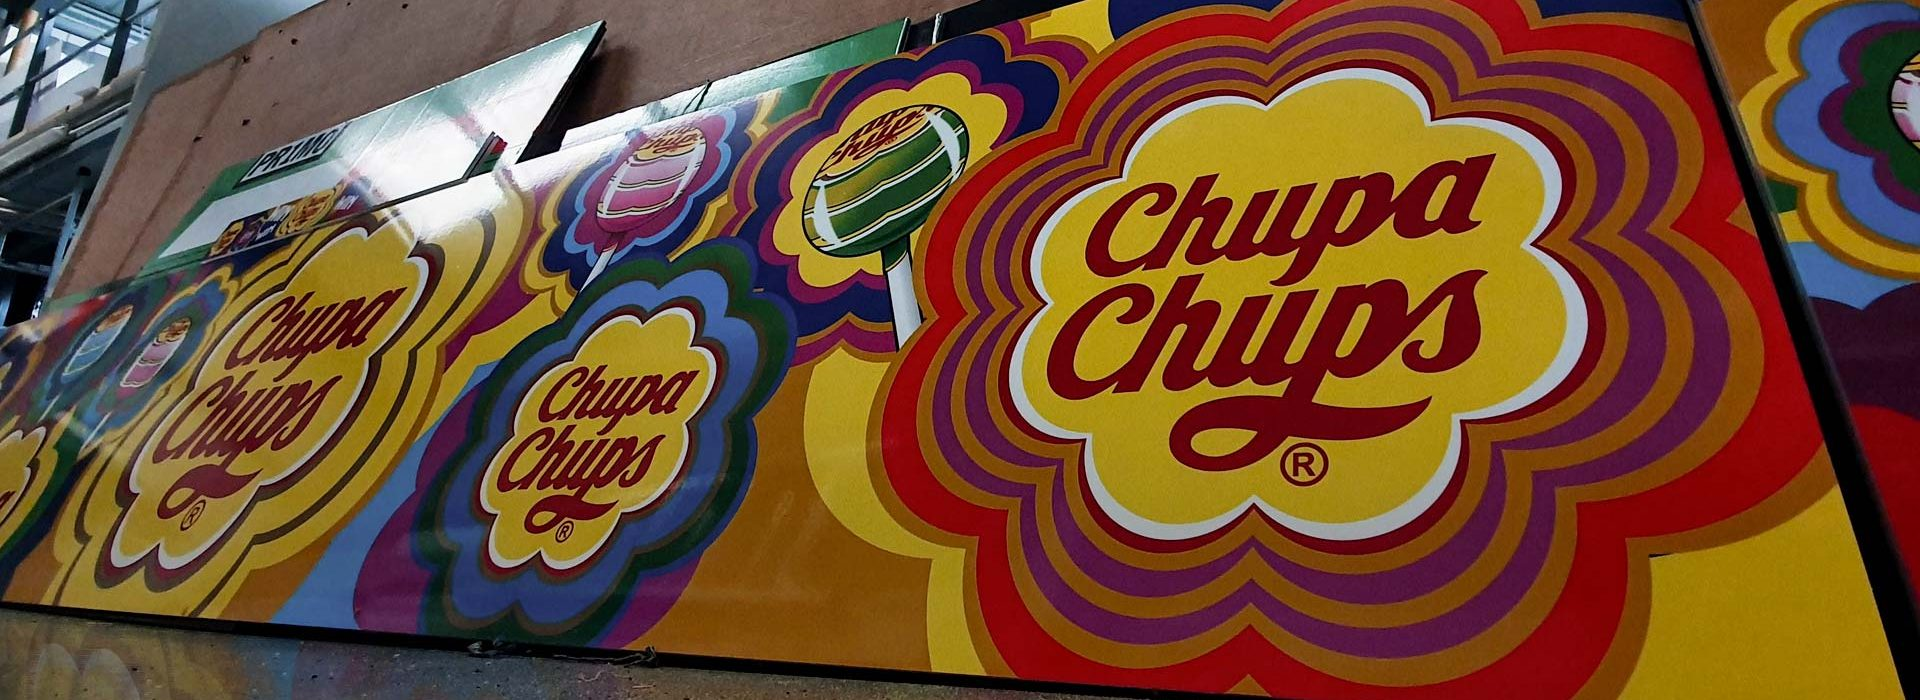 Portfolio - Chupa Chops Arcade Machine Print - Insignia Signs